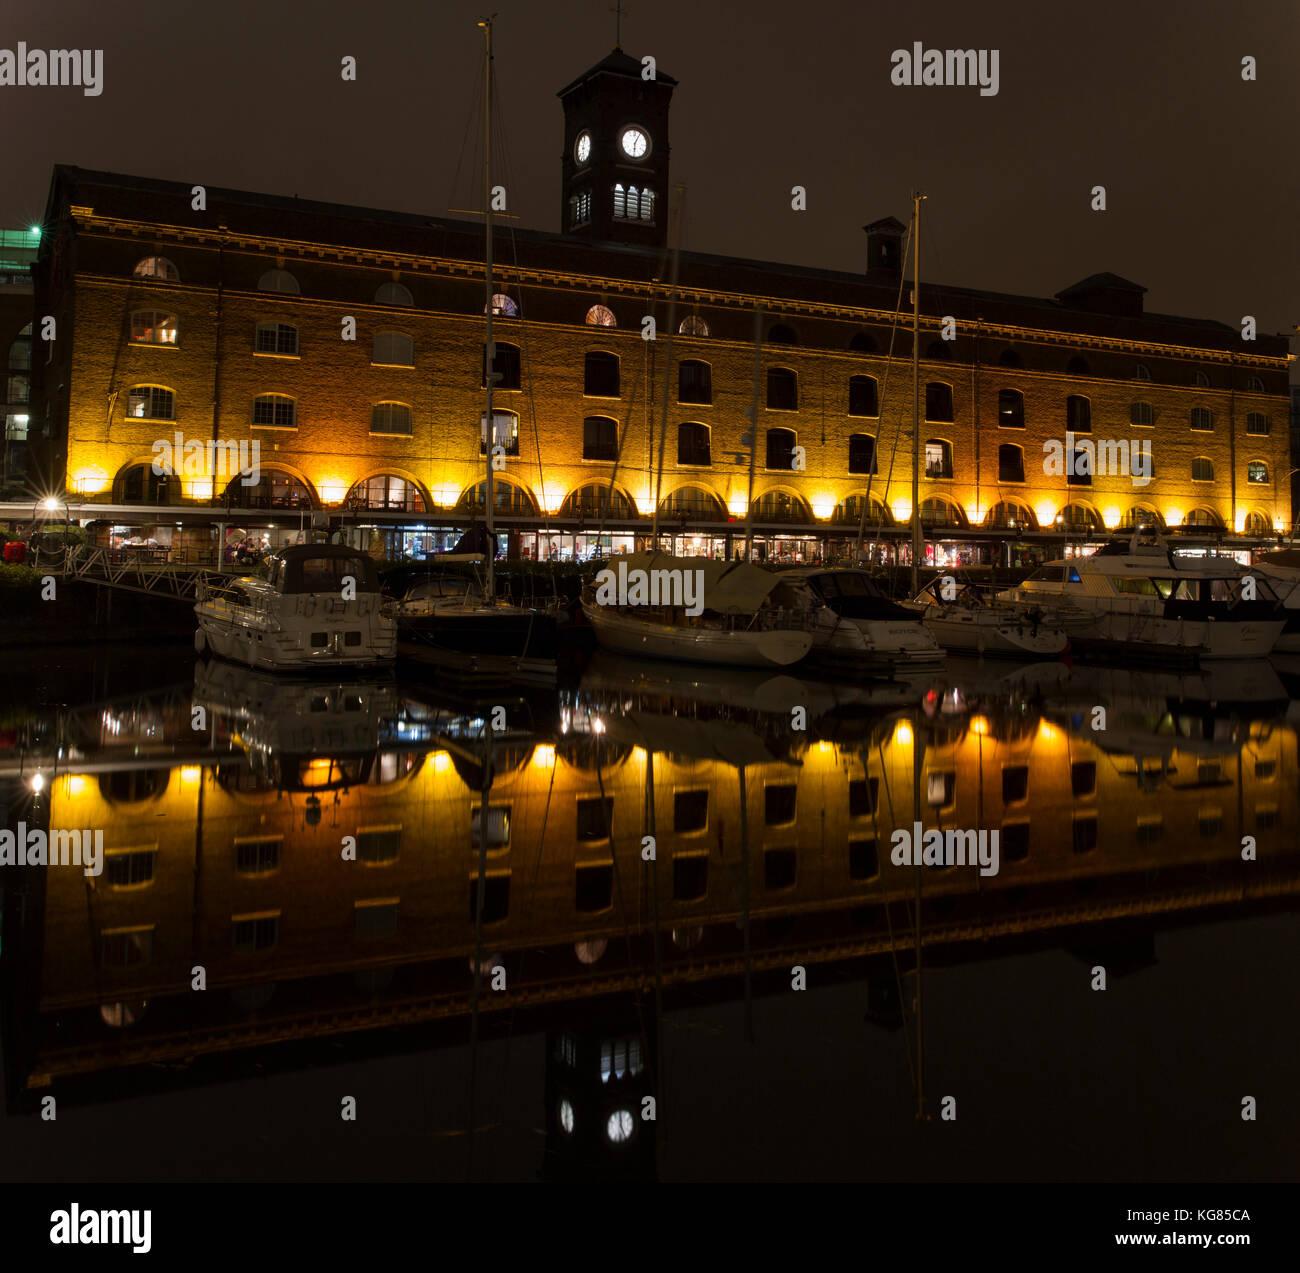 St. Katharine's Dock at night. - Stock Image